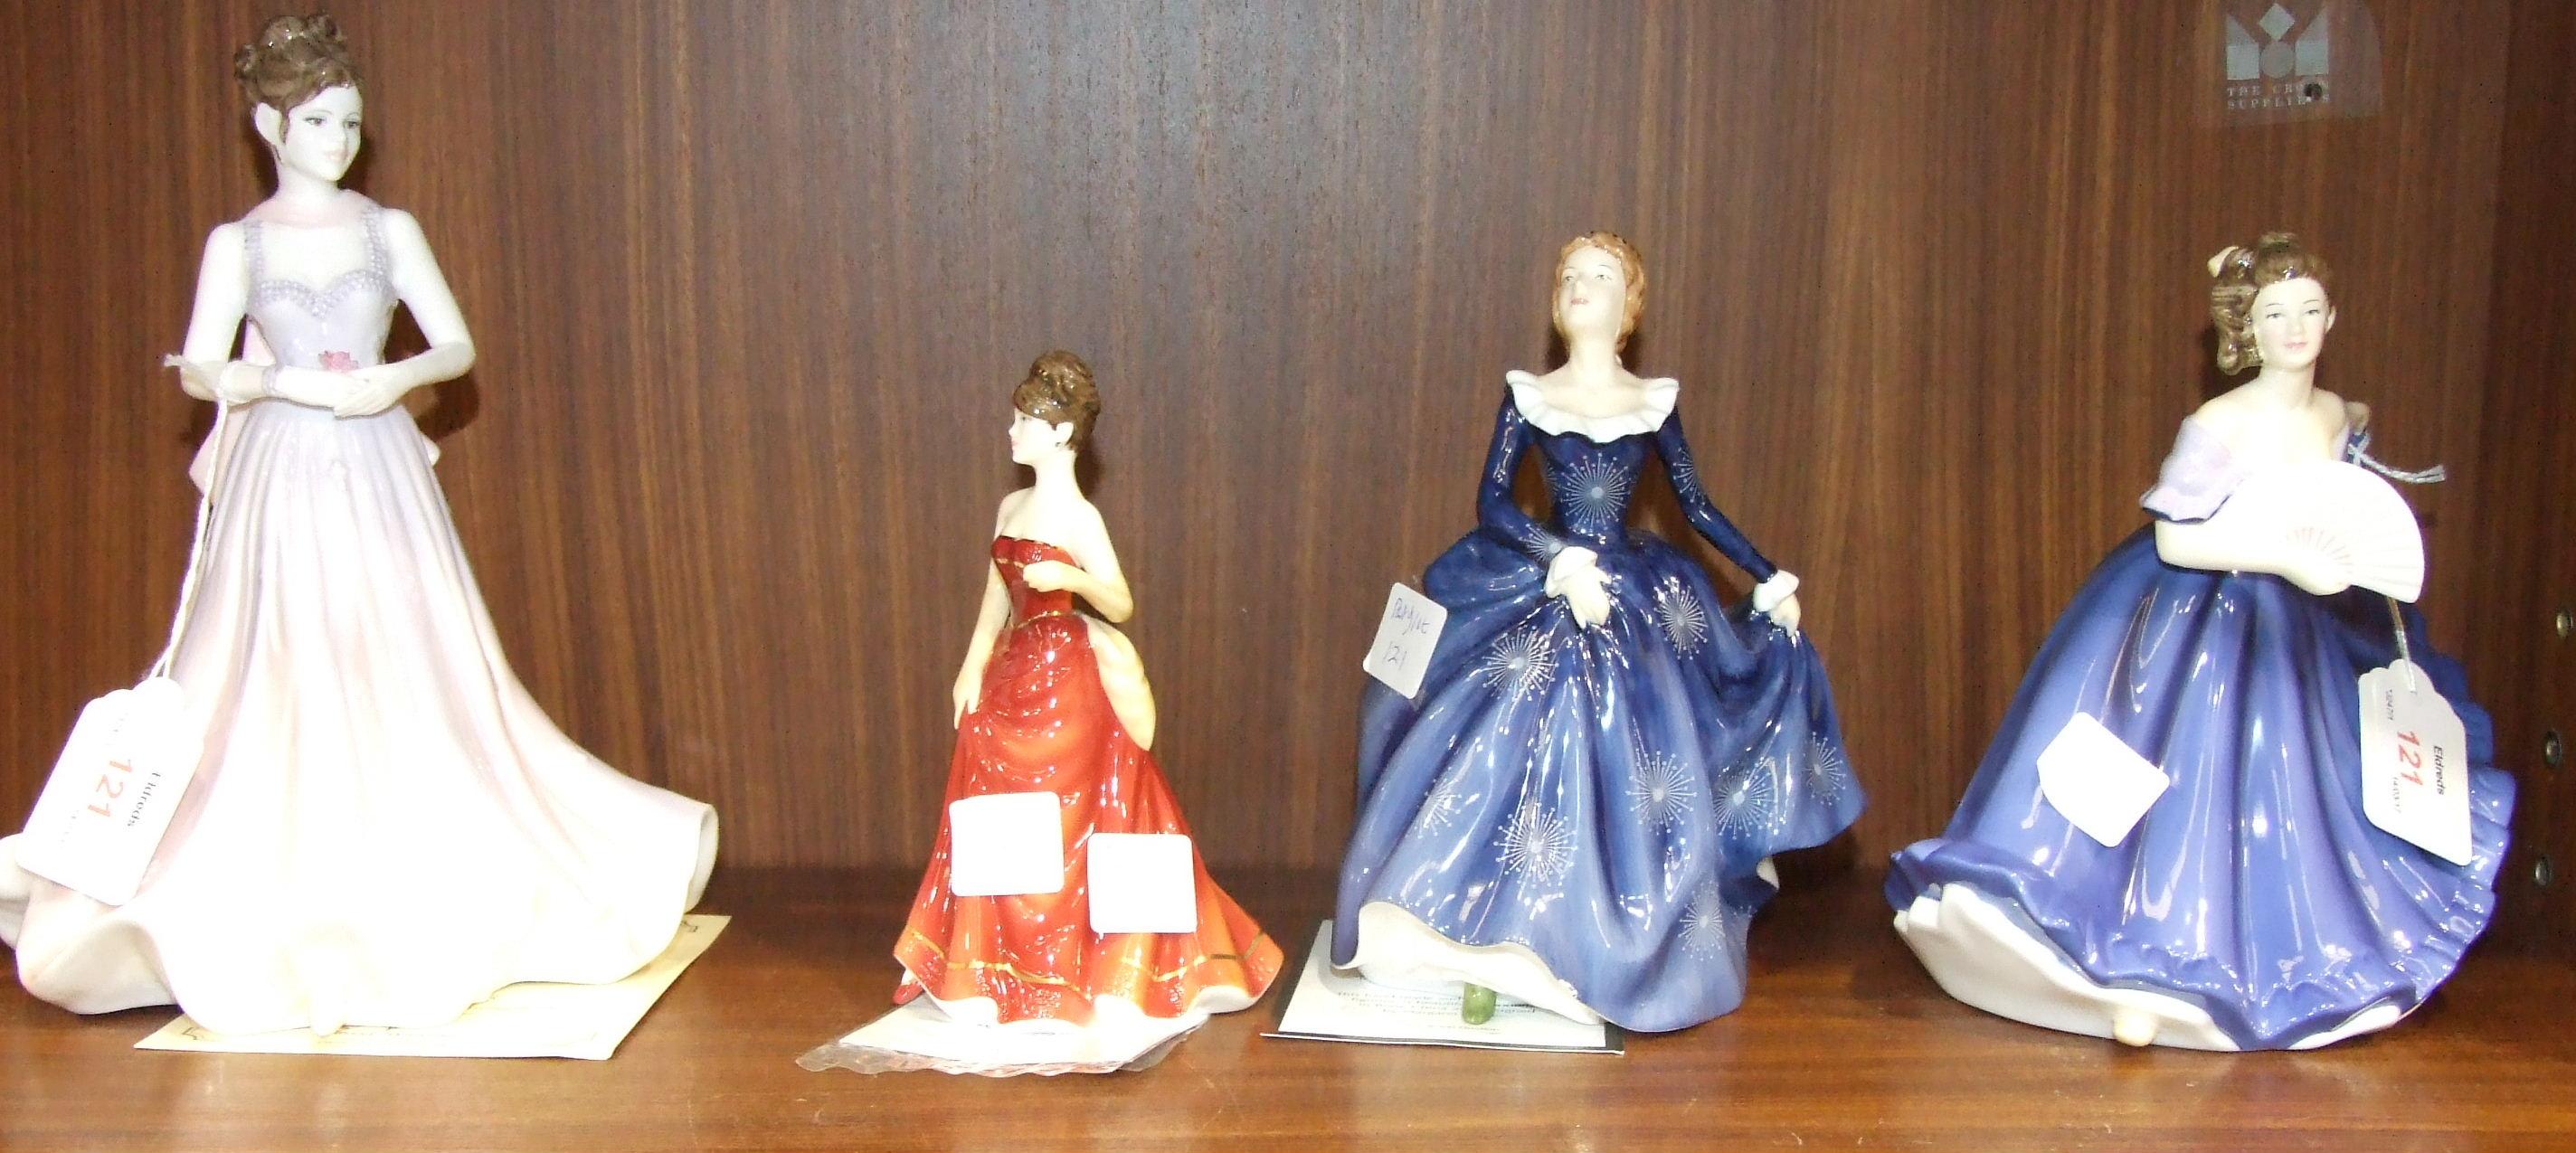 Lot 121 - Three Royal Doulton figurines: Fragrance 17cm, Elaine, True Romance and a Coalport figure, Precious,